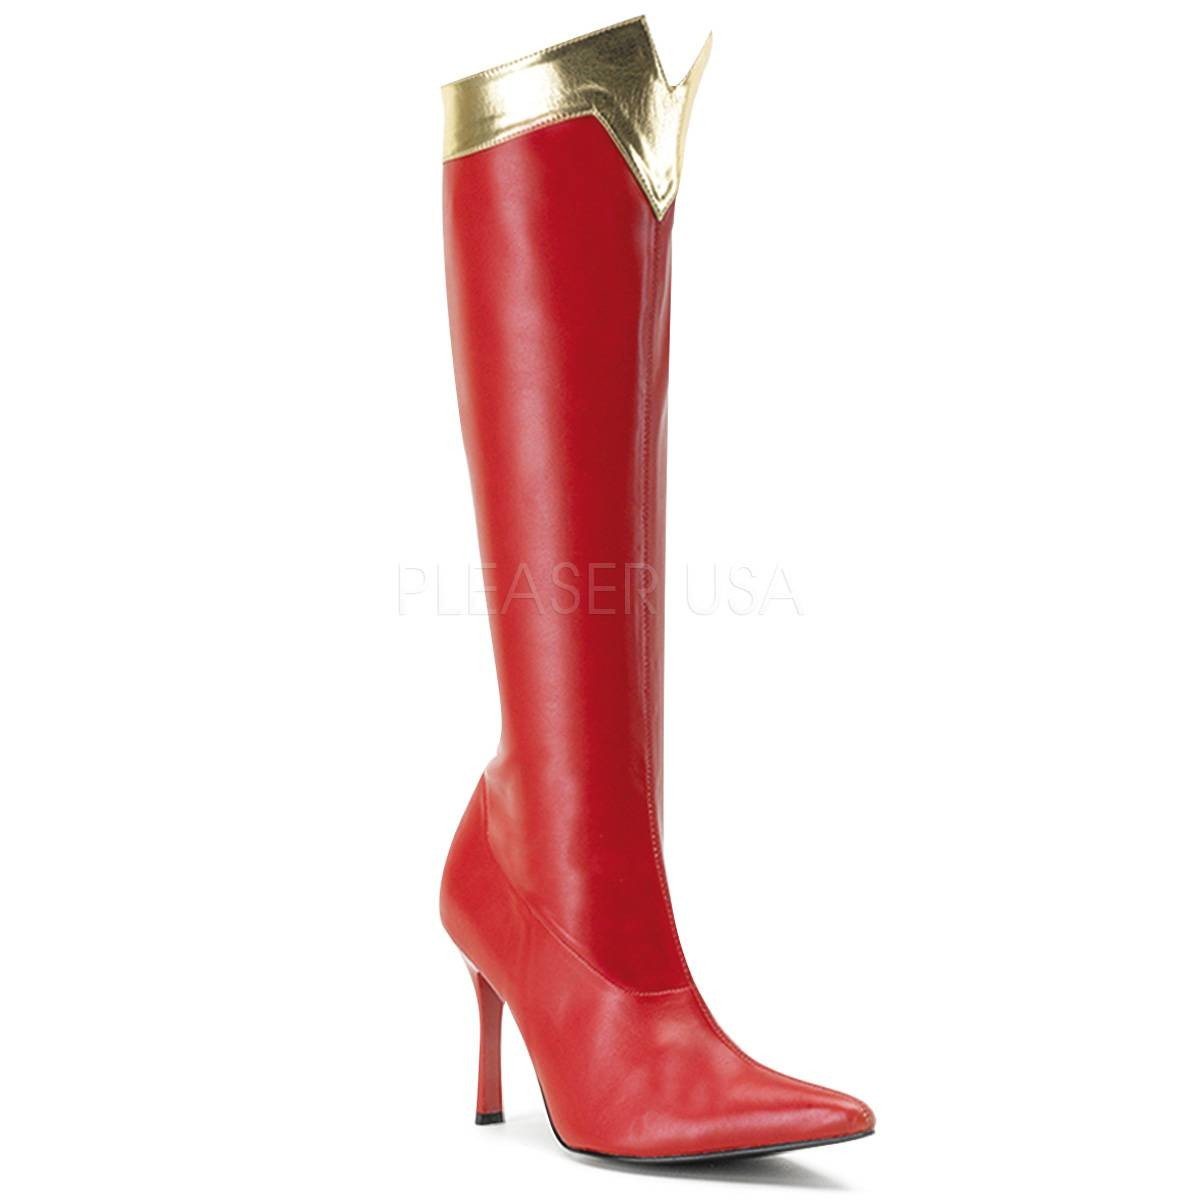 Stiefel - WONDER 130 ° Damen Overknee Stiefel ° Rot Gold Matt ° Funtasma  - Onlineshop RedSixty